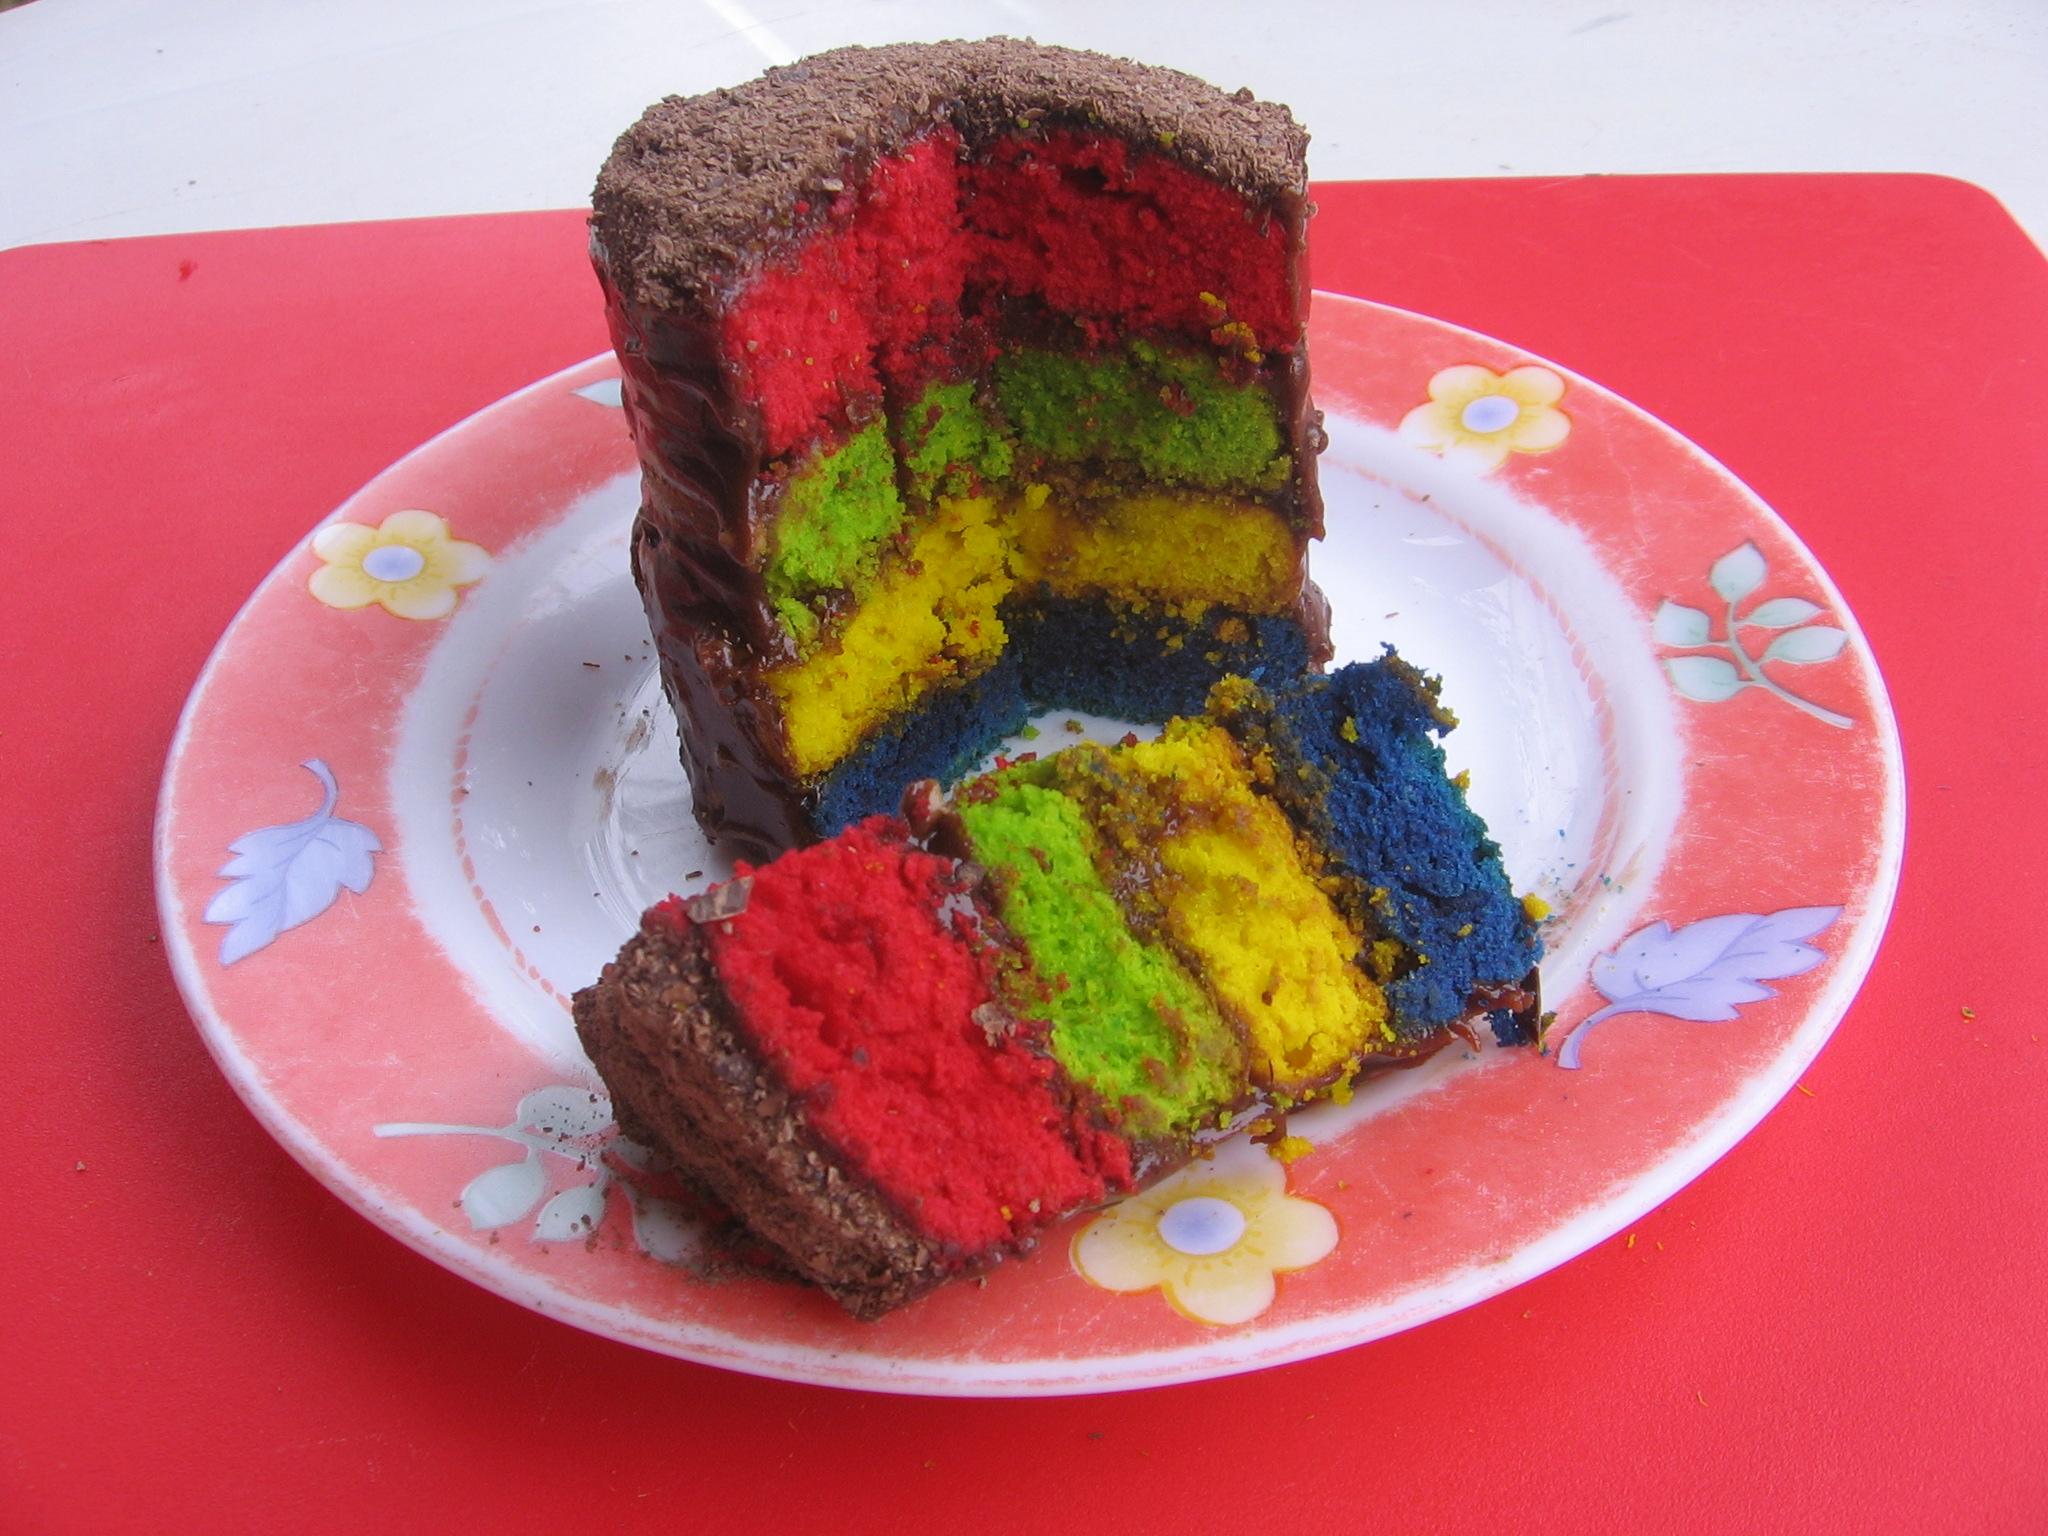 Epatez vos amis avec ce Rainbow Cake